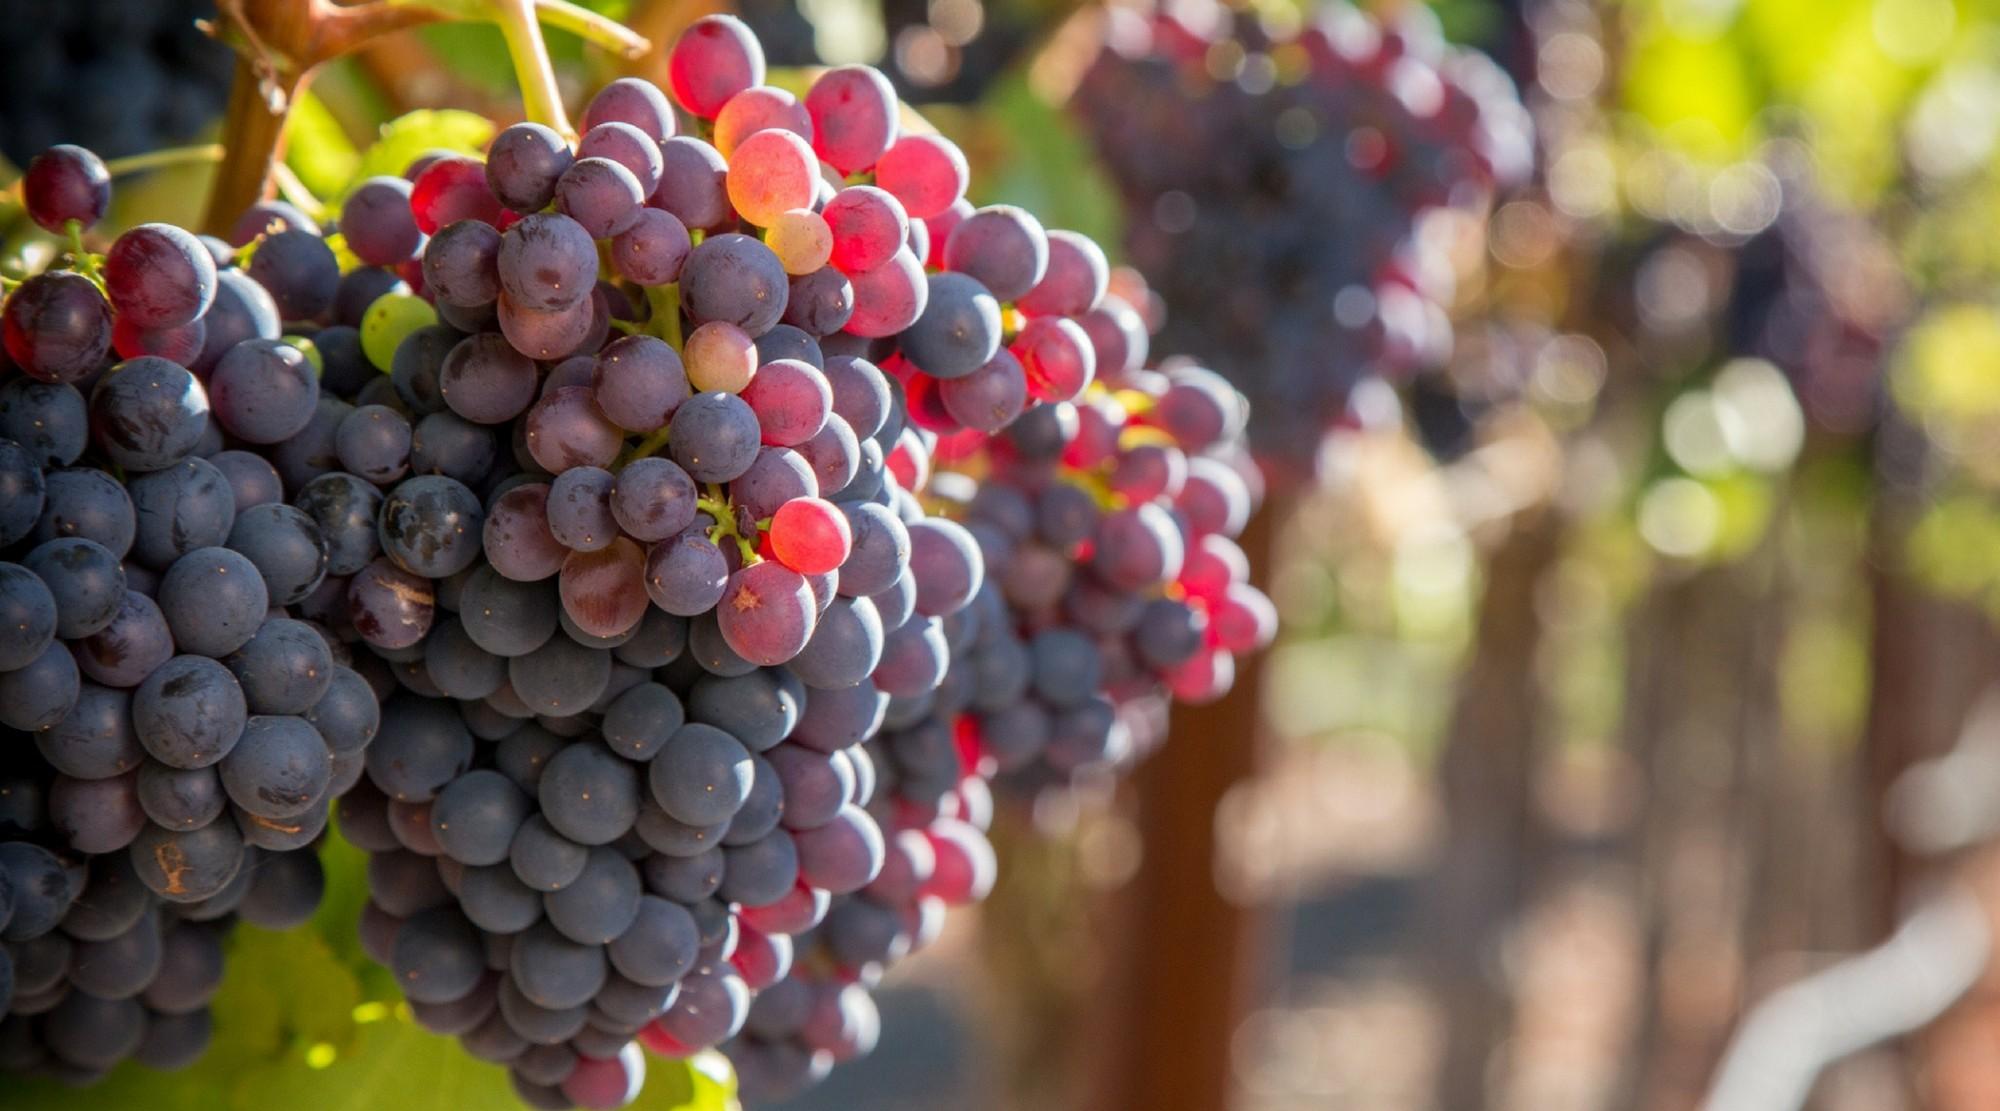 The Splendid Table: An expert guide to American Rhône wines | 09/08/17